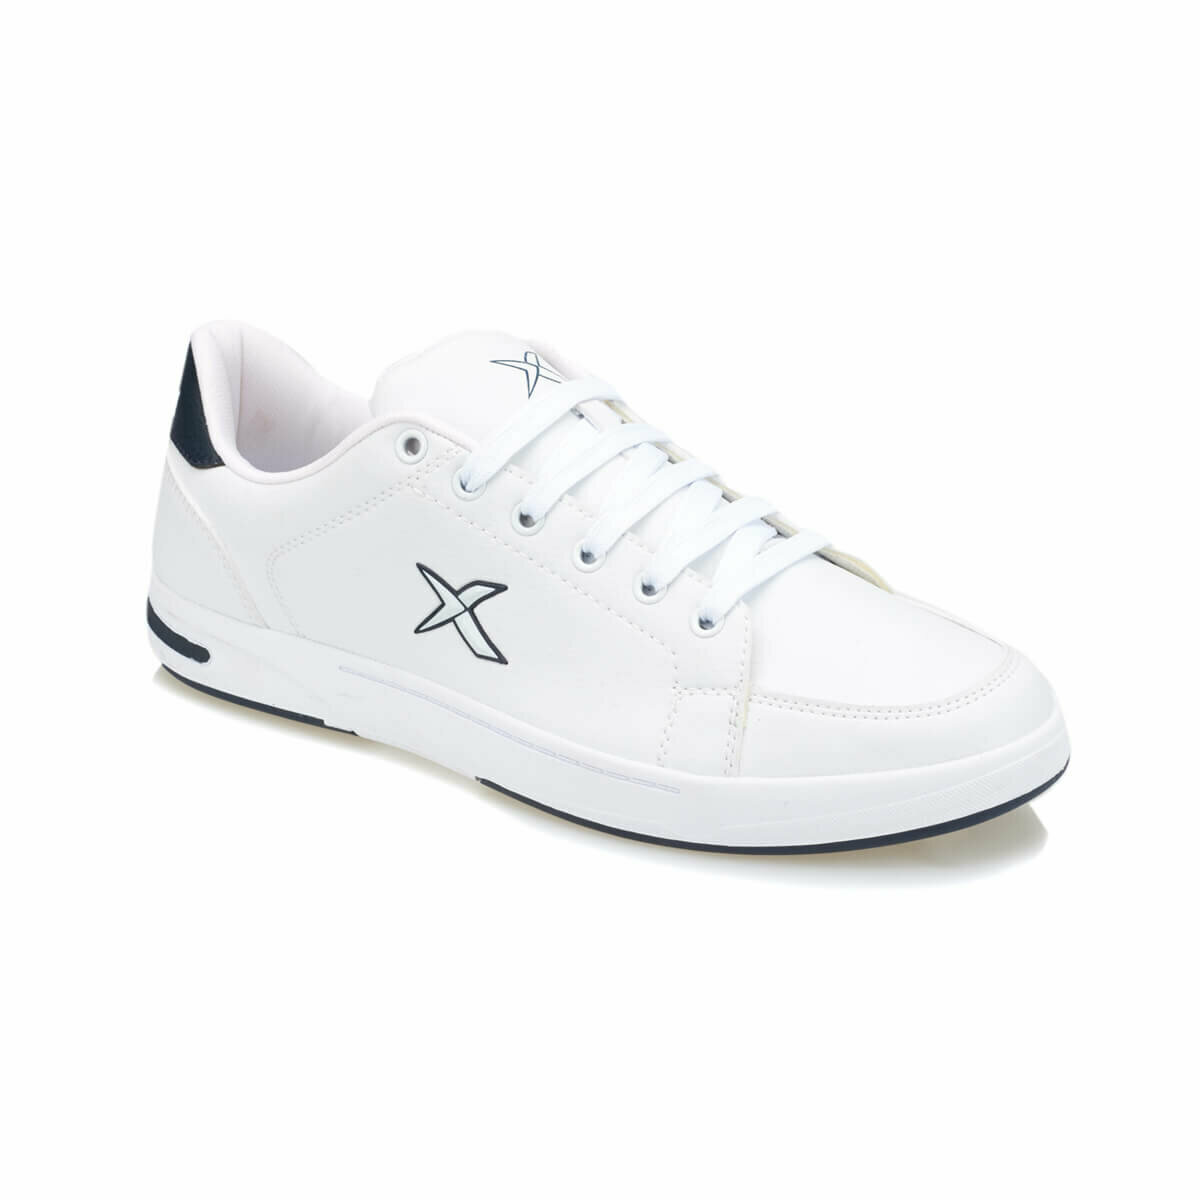 FLO NEIL M White Men 'S Sneaker Shoes KINETIX